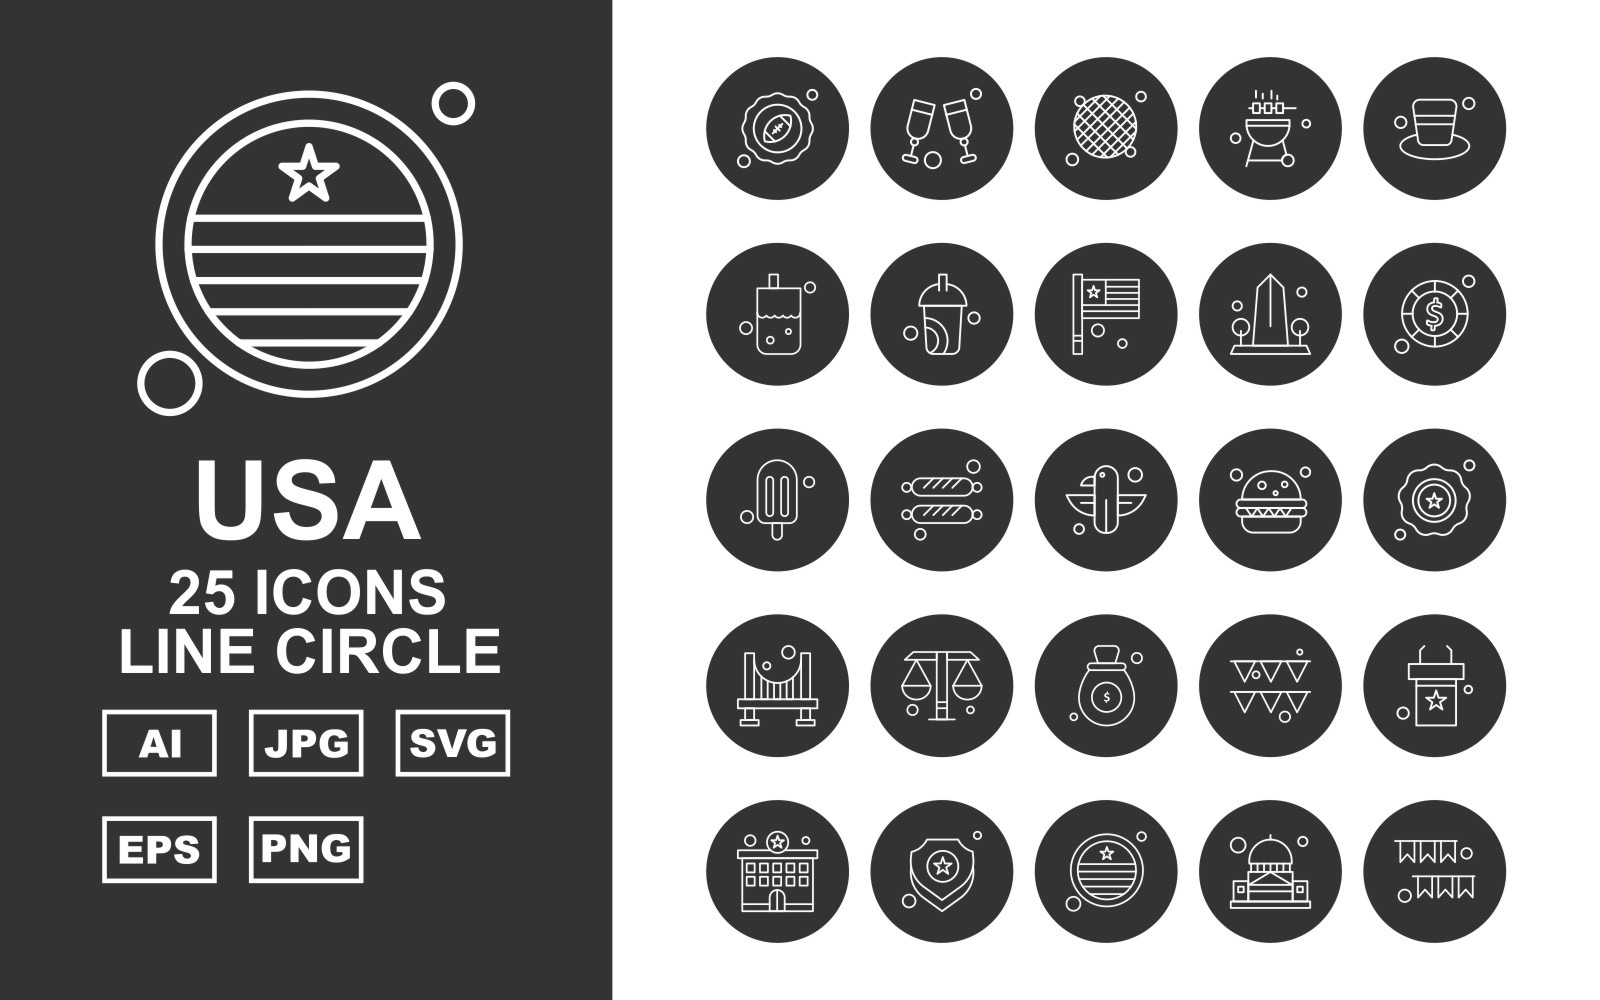 25 Premium USA Line Circle Icon Pack Icon Sets 164745